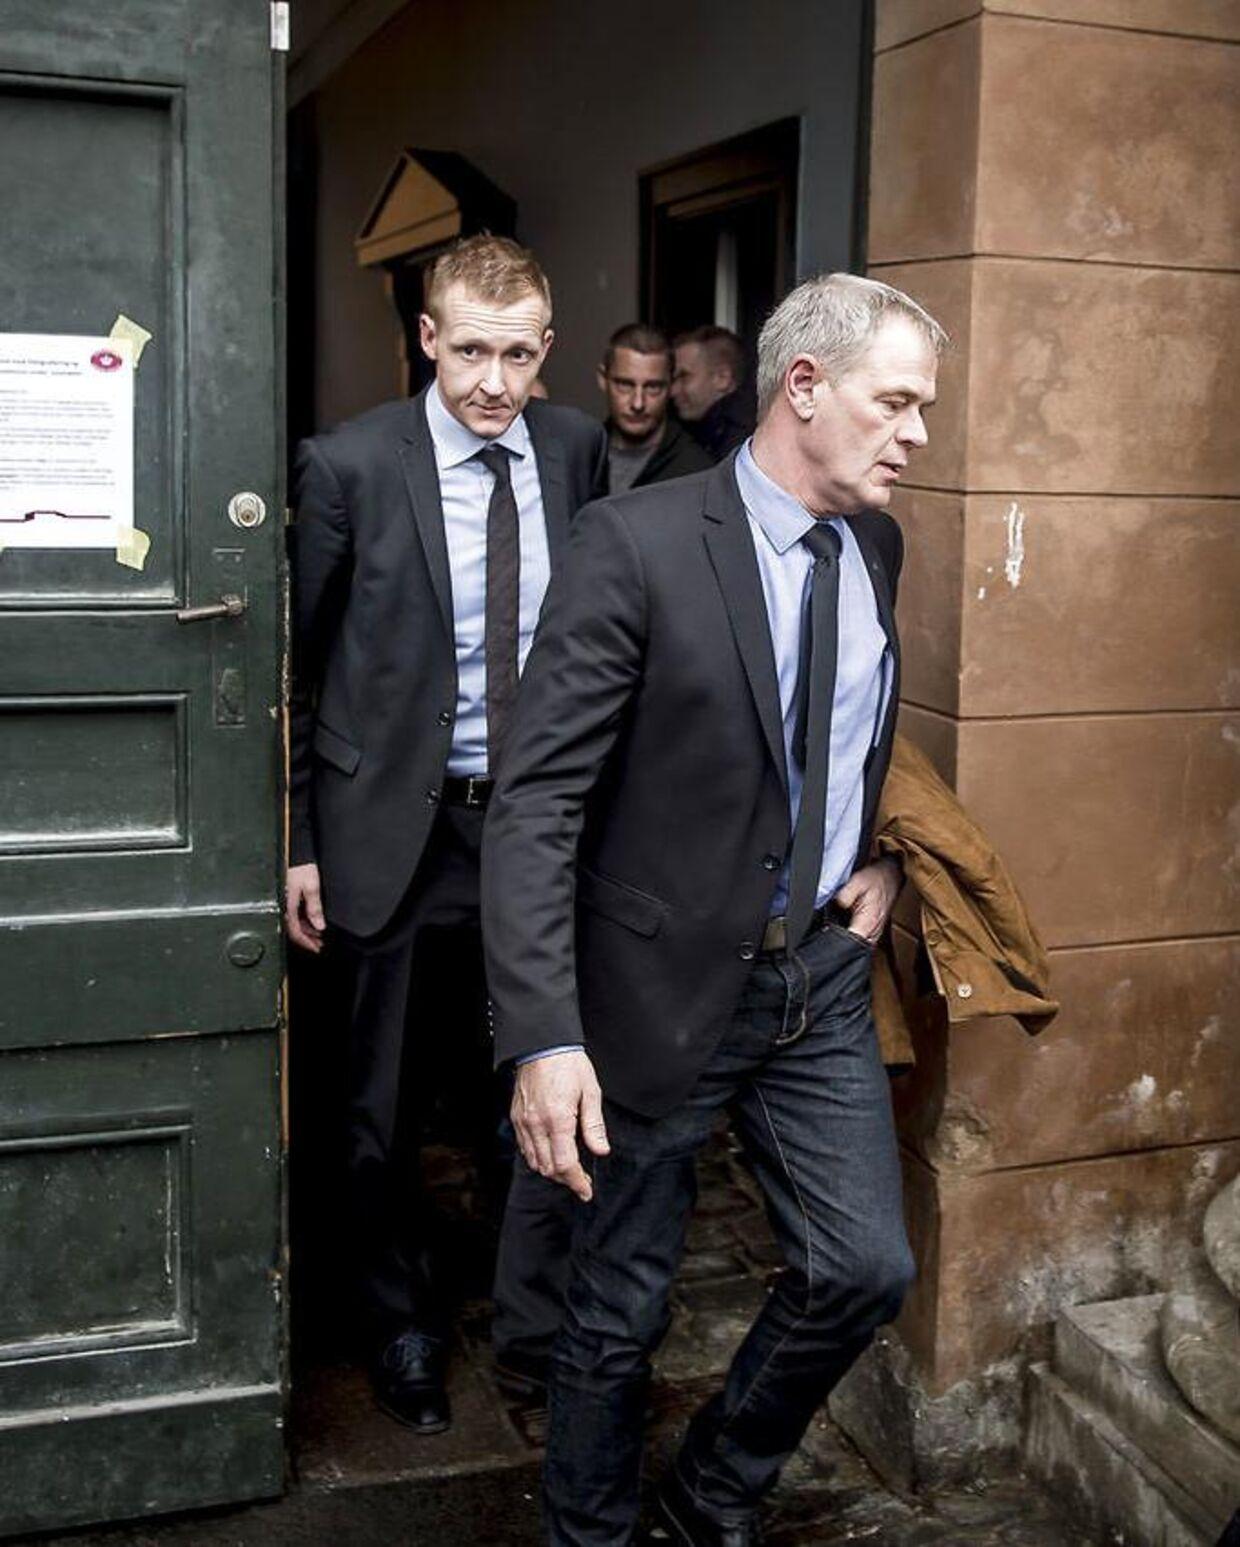 Virkelighedens anklager Jakob Buch-Jepsen og vicepolitiinspektør Jens Møller forlader retsbygningen i en pause under retssagen mod Peter Madsen.